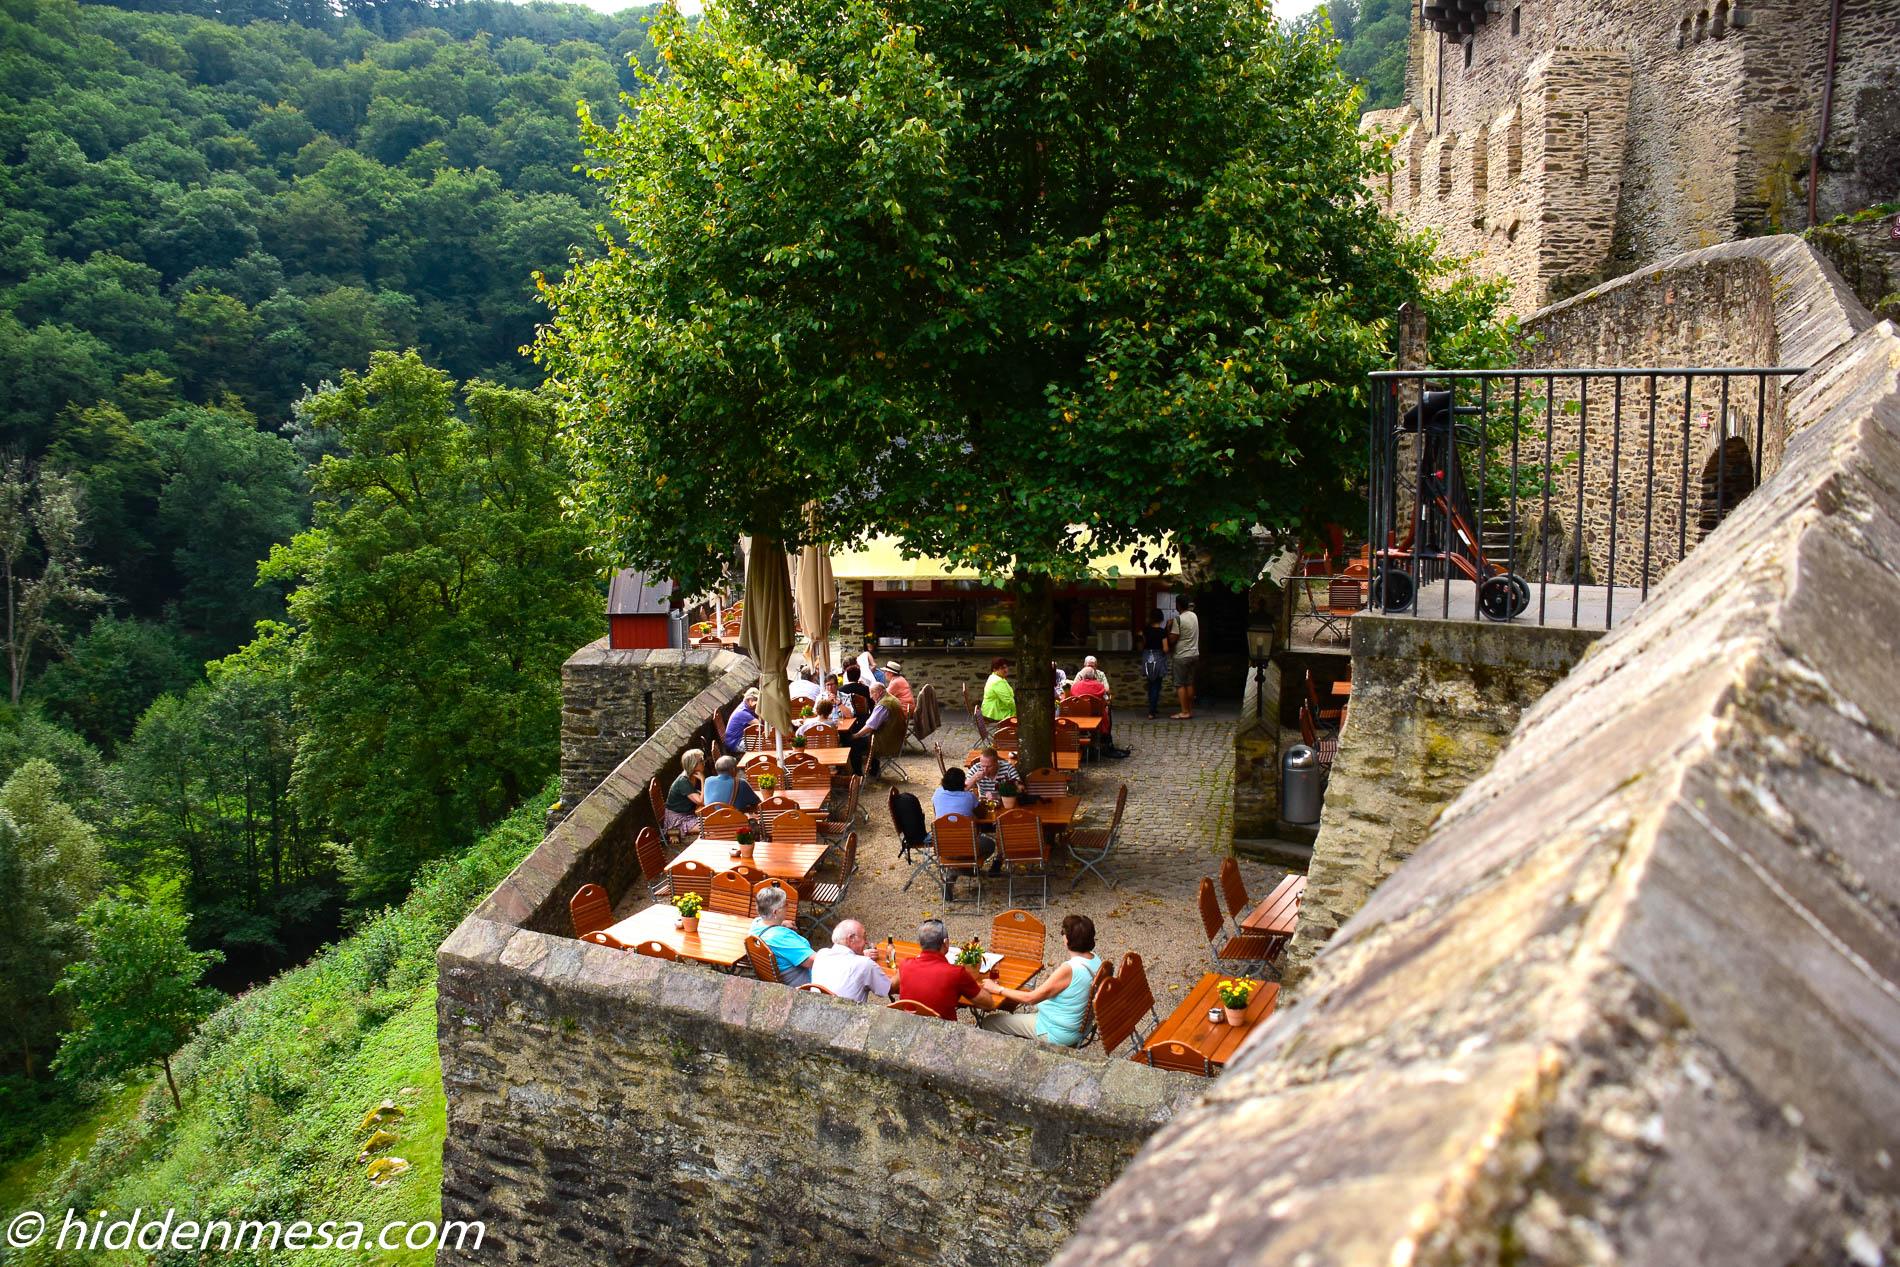 Restaurantat Burg Eltz